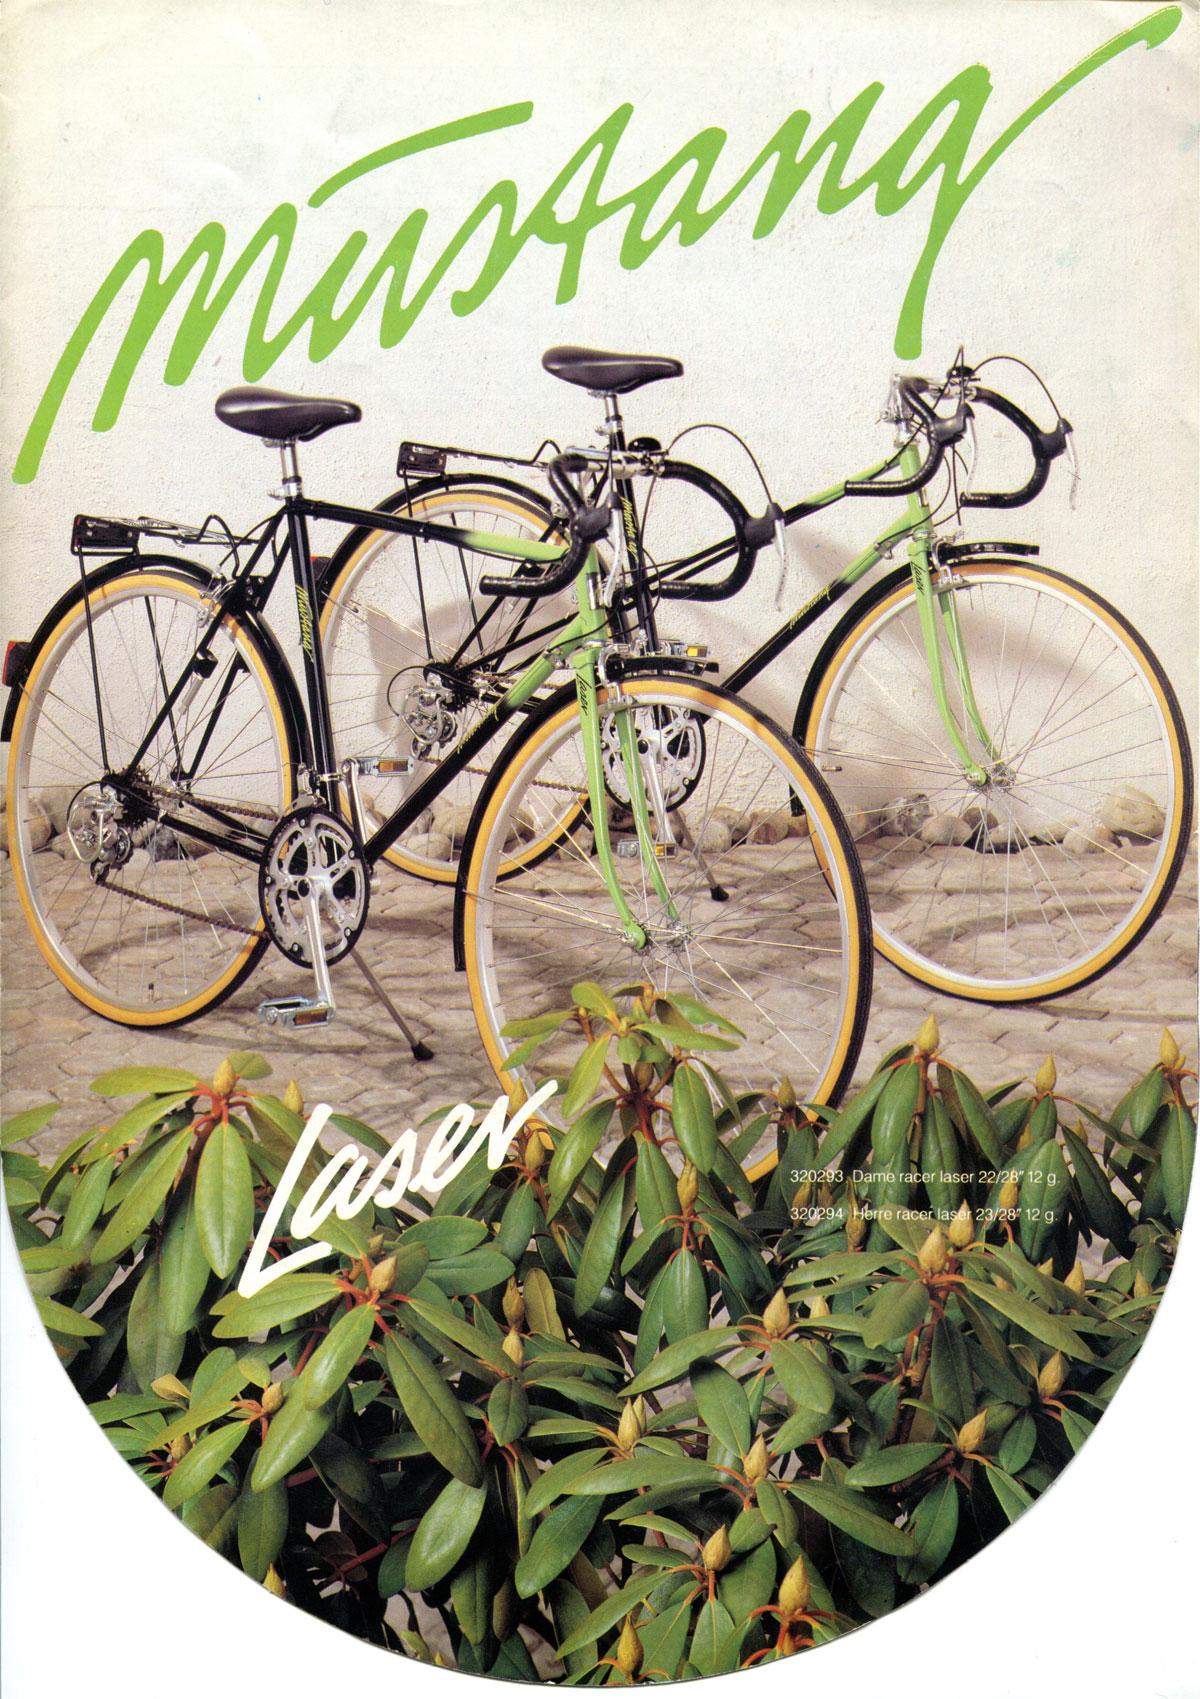 Retro cykler fra Mustang - Billede 2